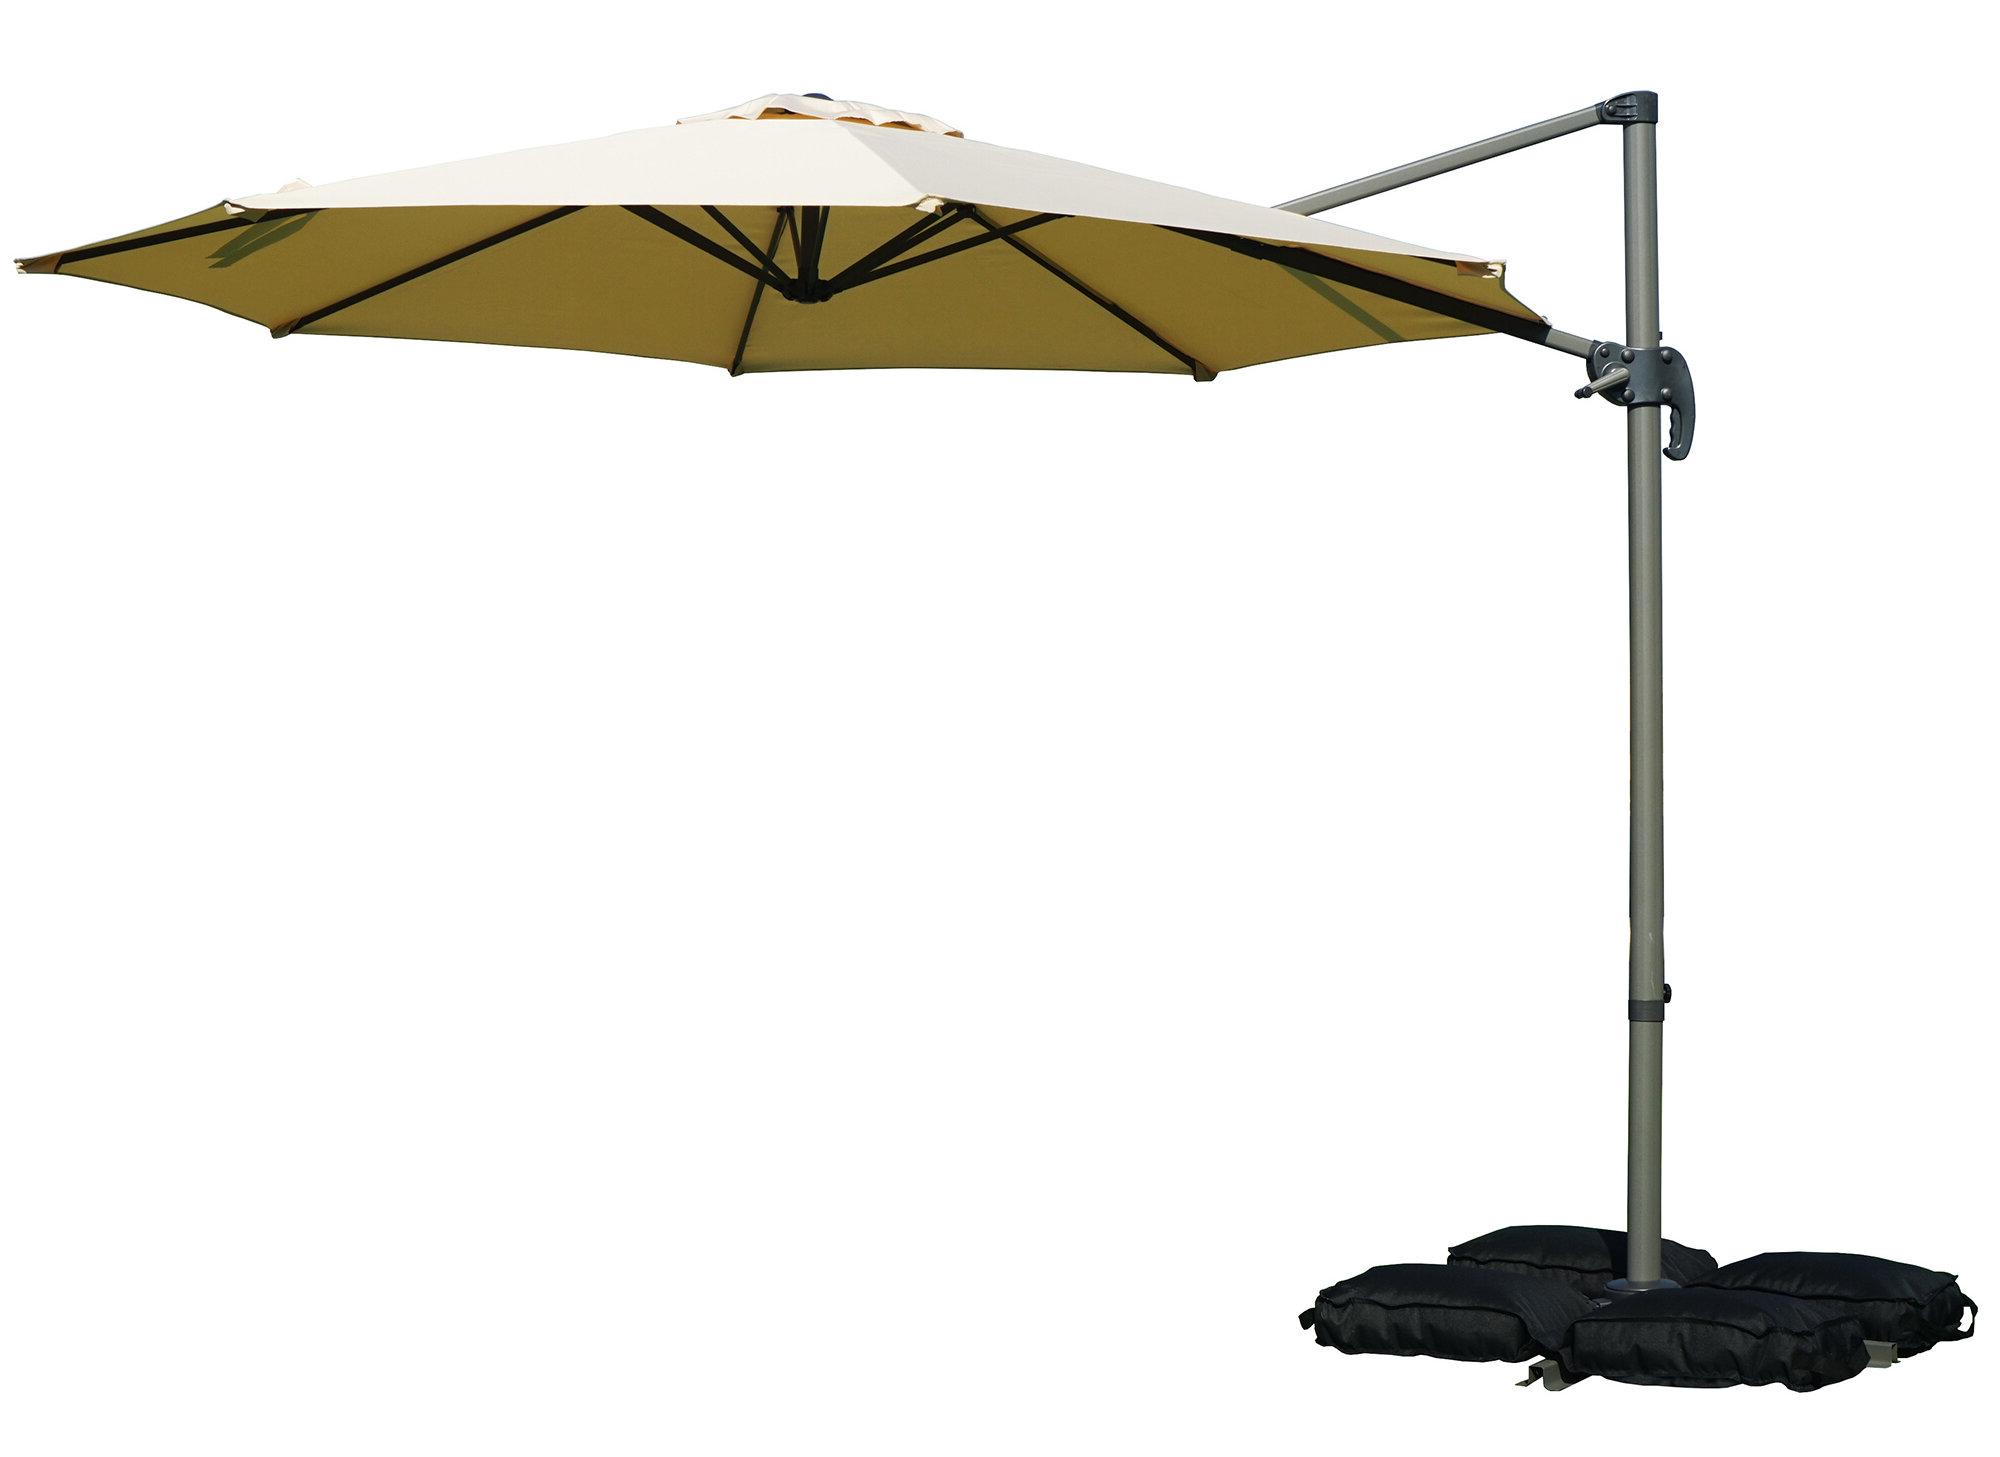 Judah Cantilever Umbrellas Throughout Newest Tottenham Patio Hanging Offset 10' Cantilever Umbrella (View 8 of 20)